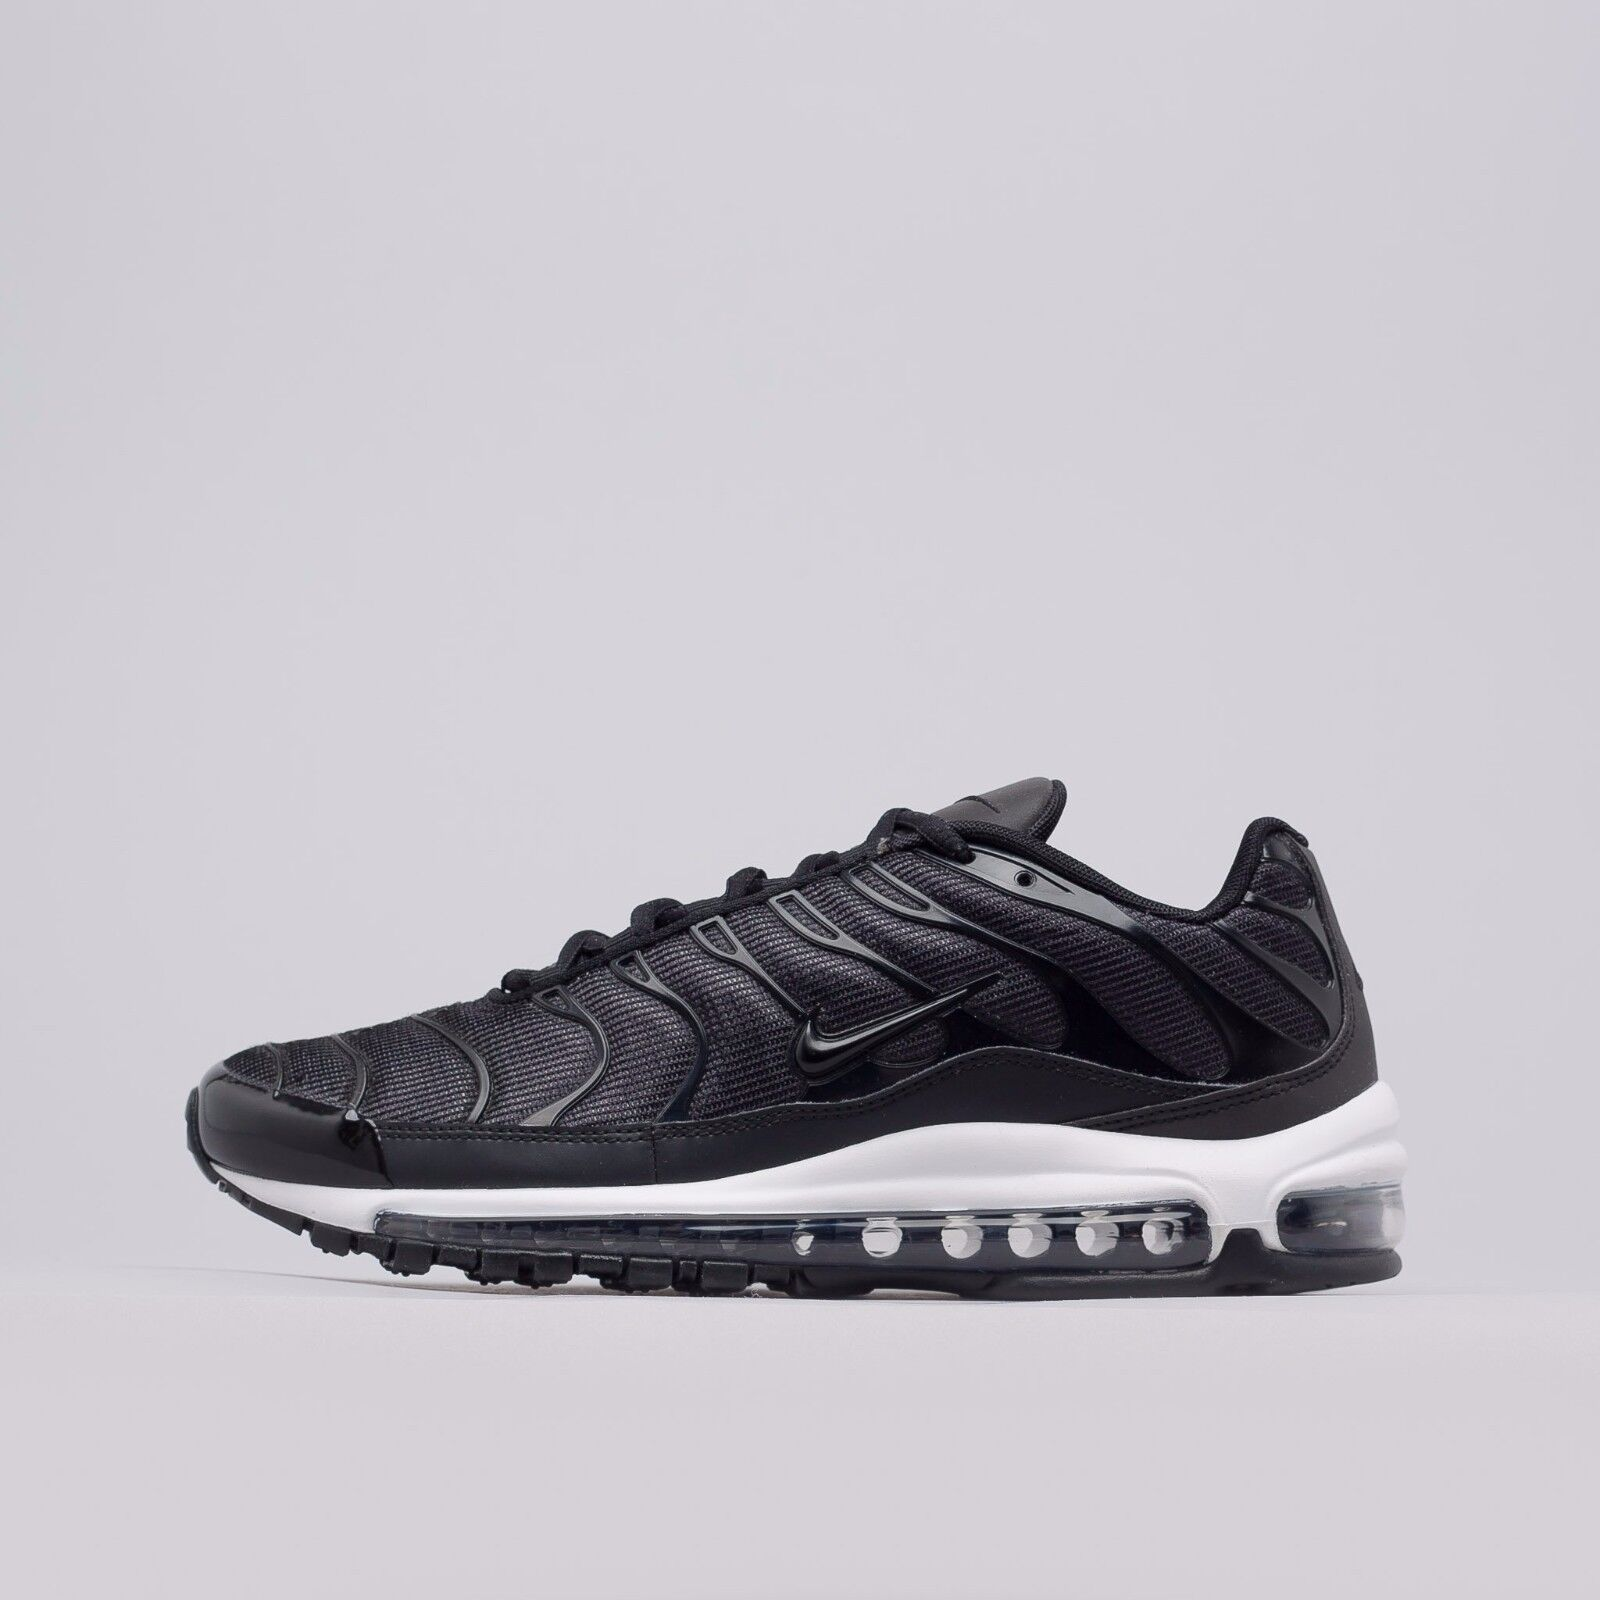 Nike air max   97 messa a punto nero / bianco ah8144-001 Uomo.